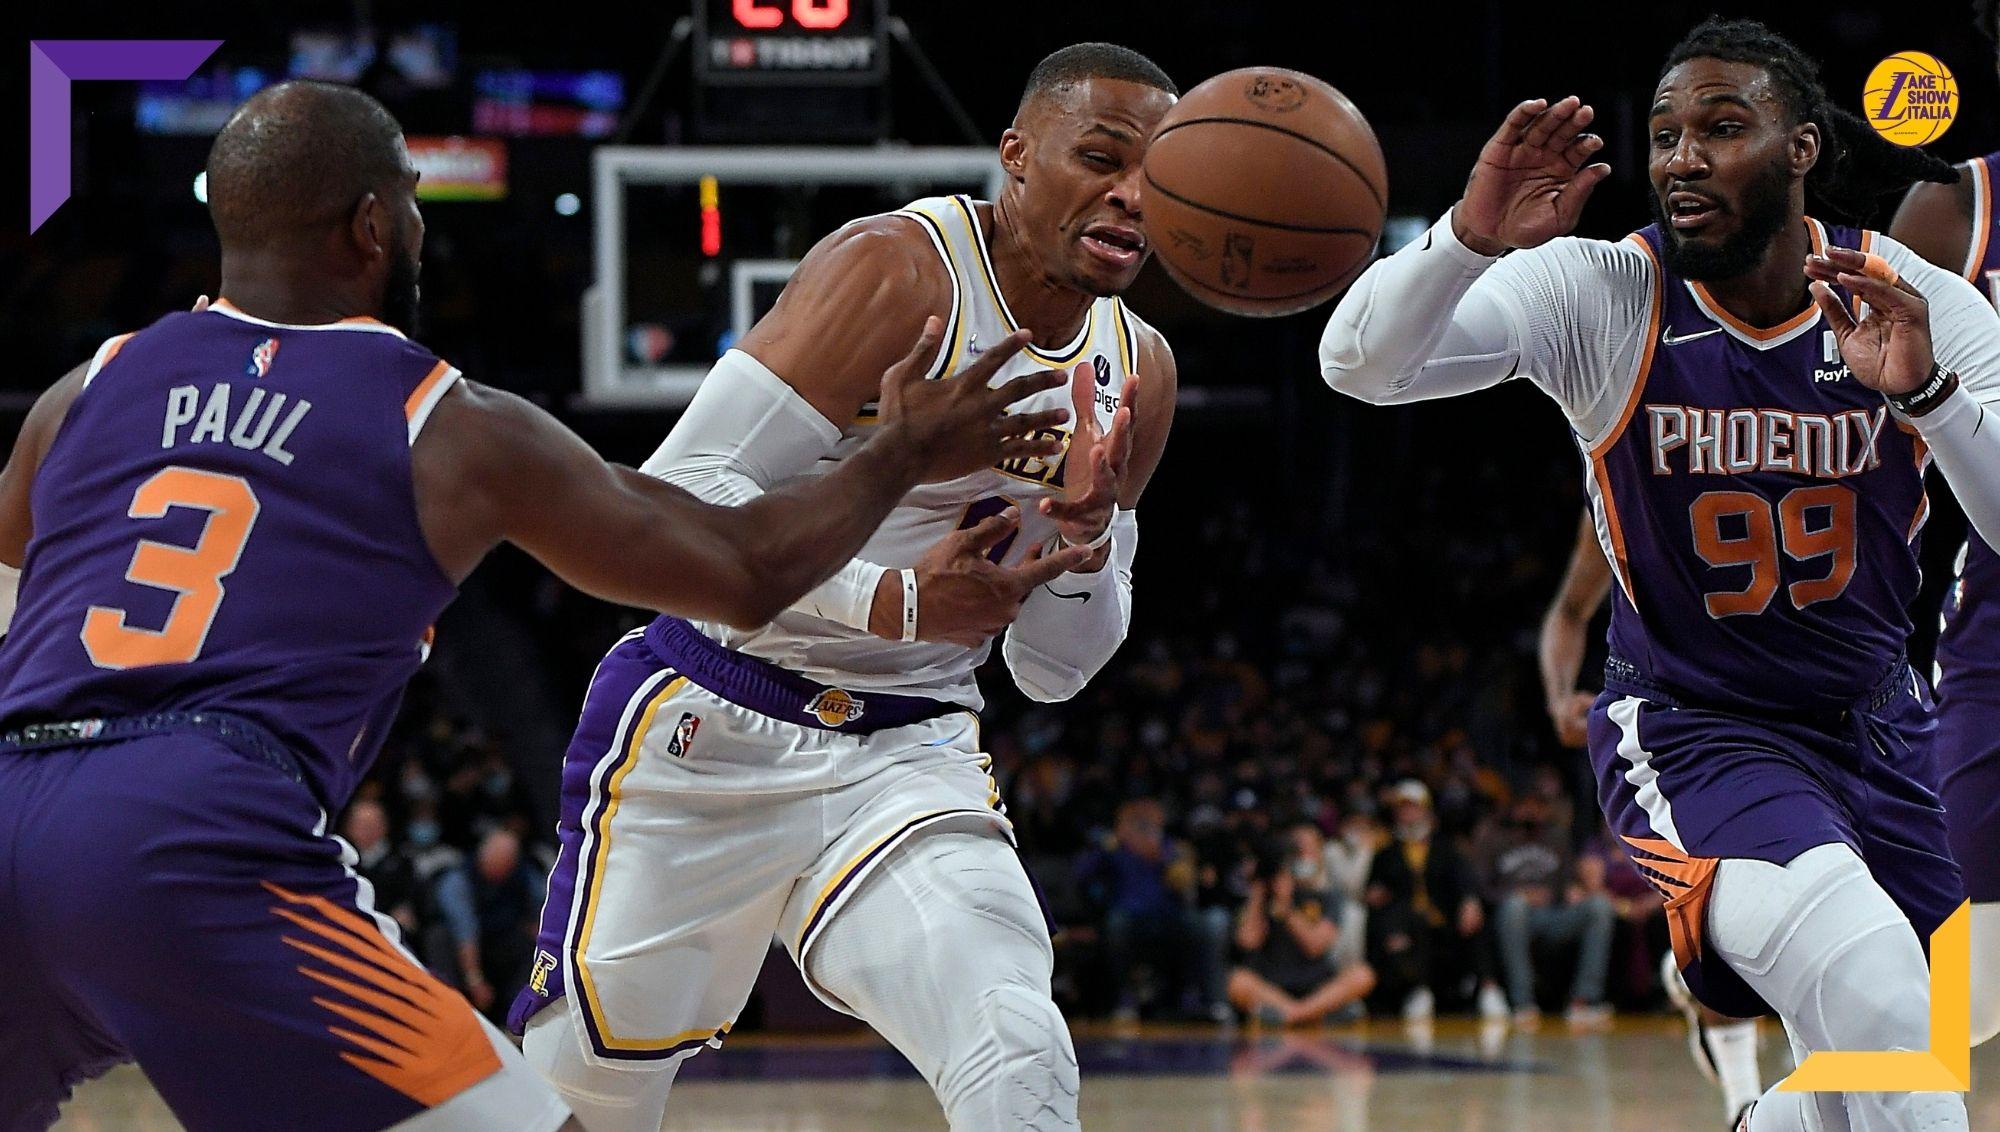 Quarta sconfitta per i Los Angeles Lakers, battuti ancora dai Phoenix Suns. Anthony Davis in crescita, male Westbrook, a riposo LeBron James.